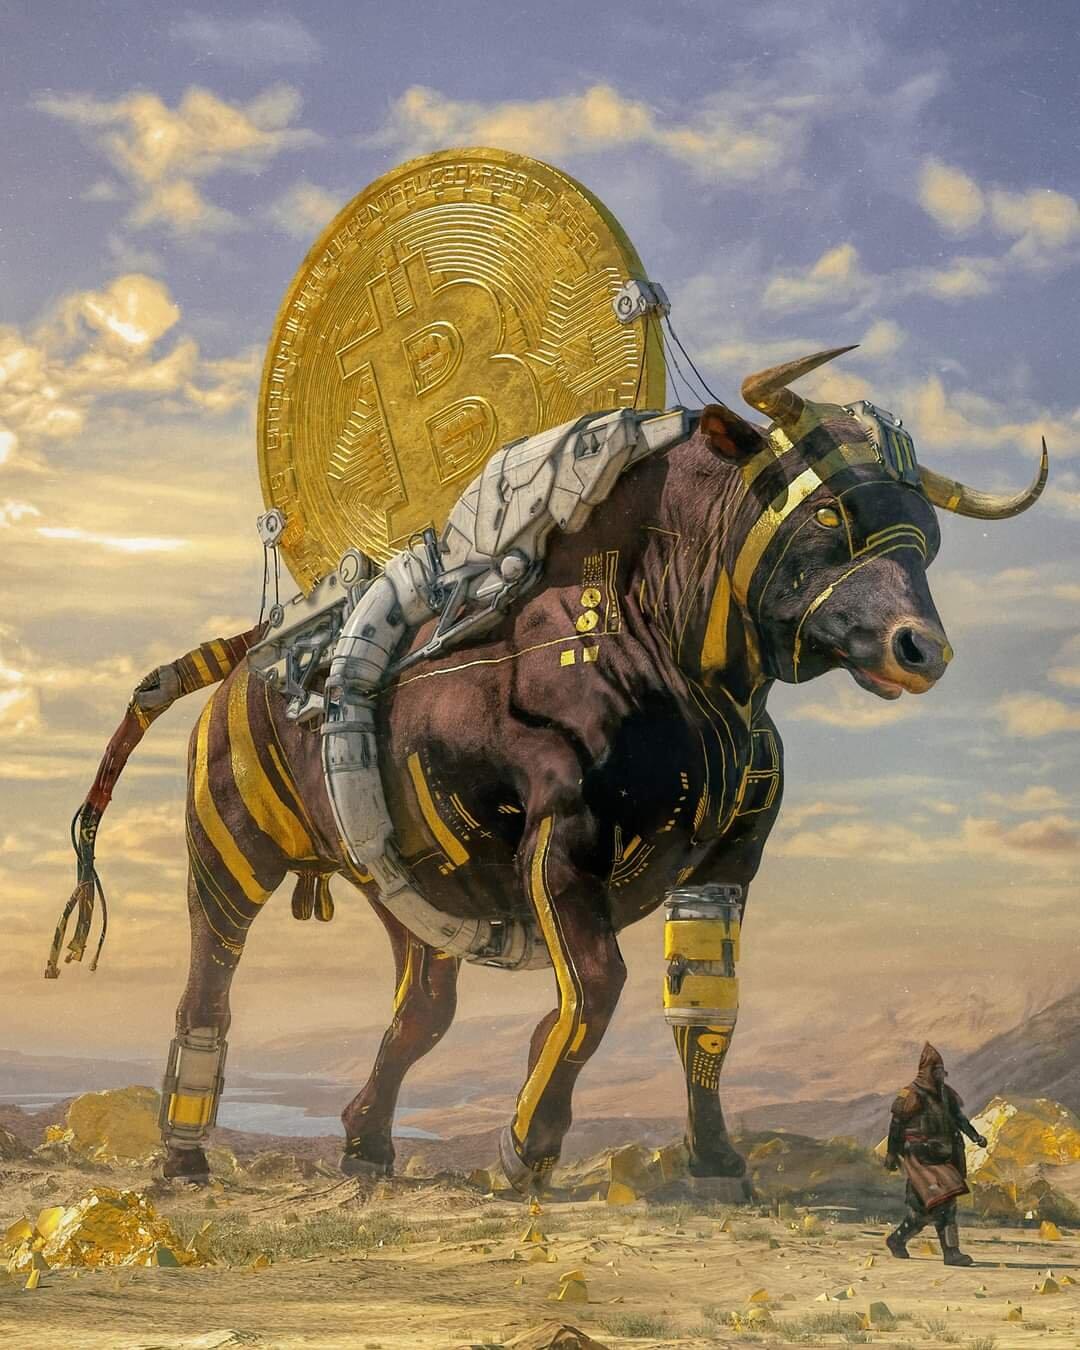 'Bull Run' by Beeple